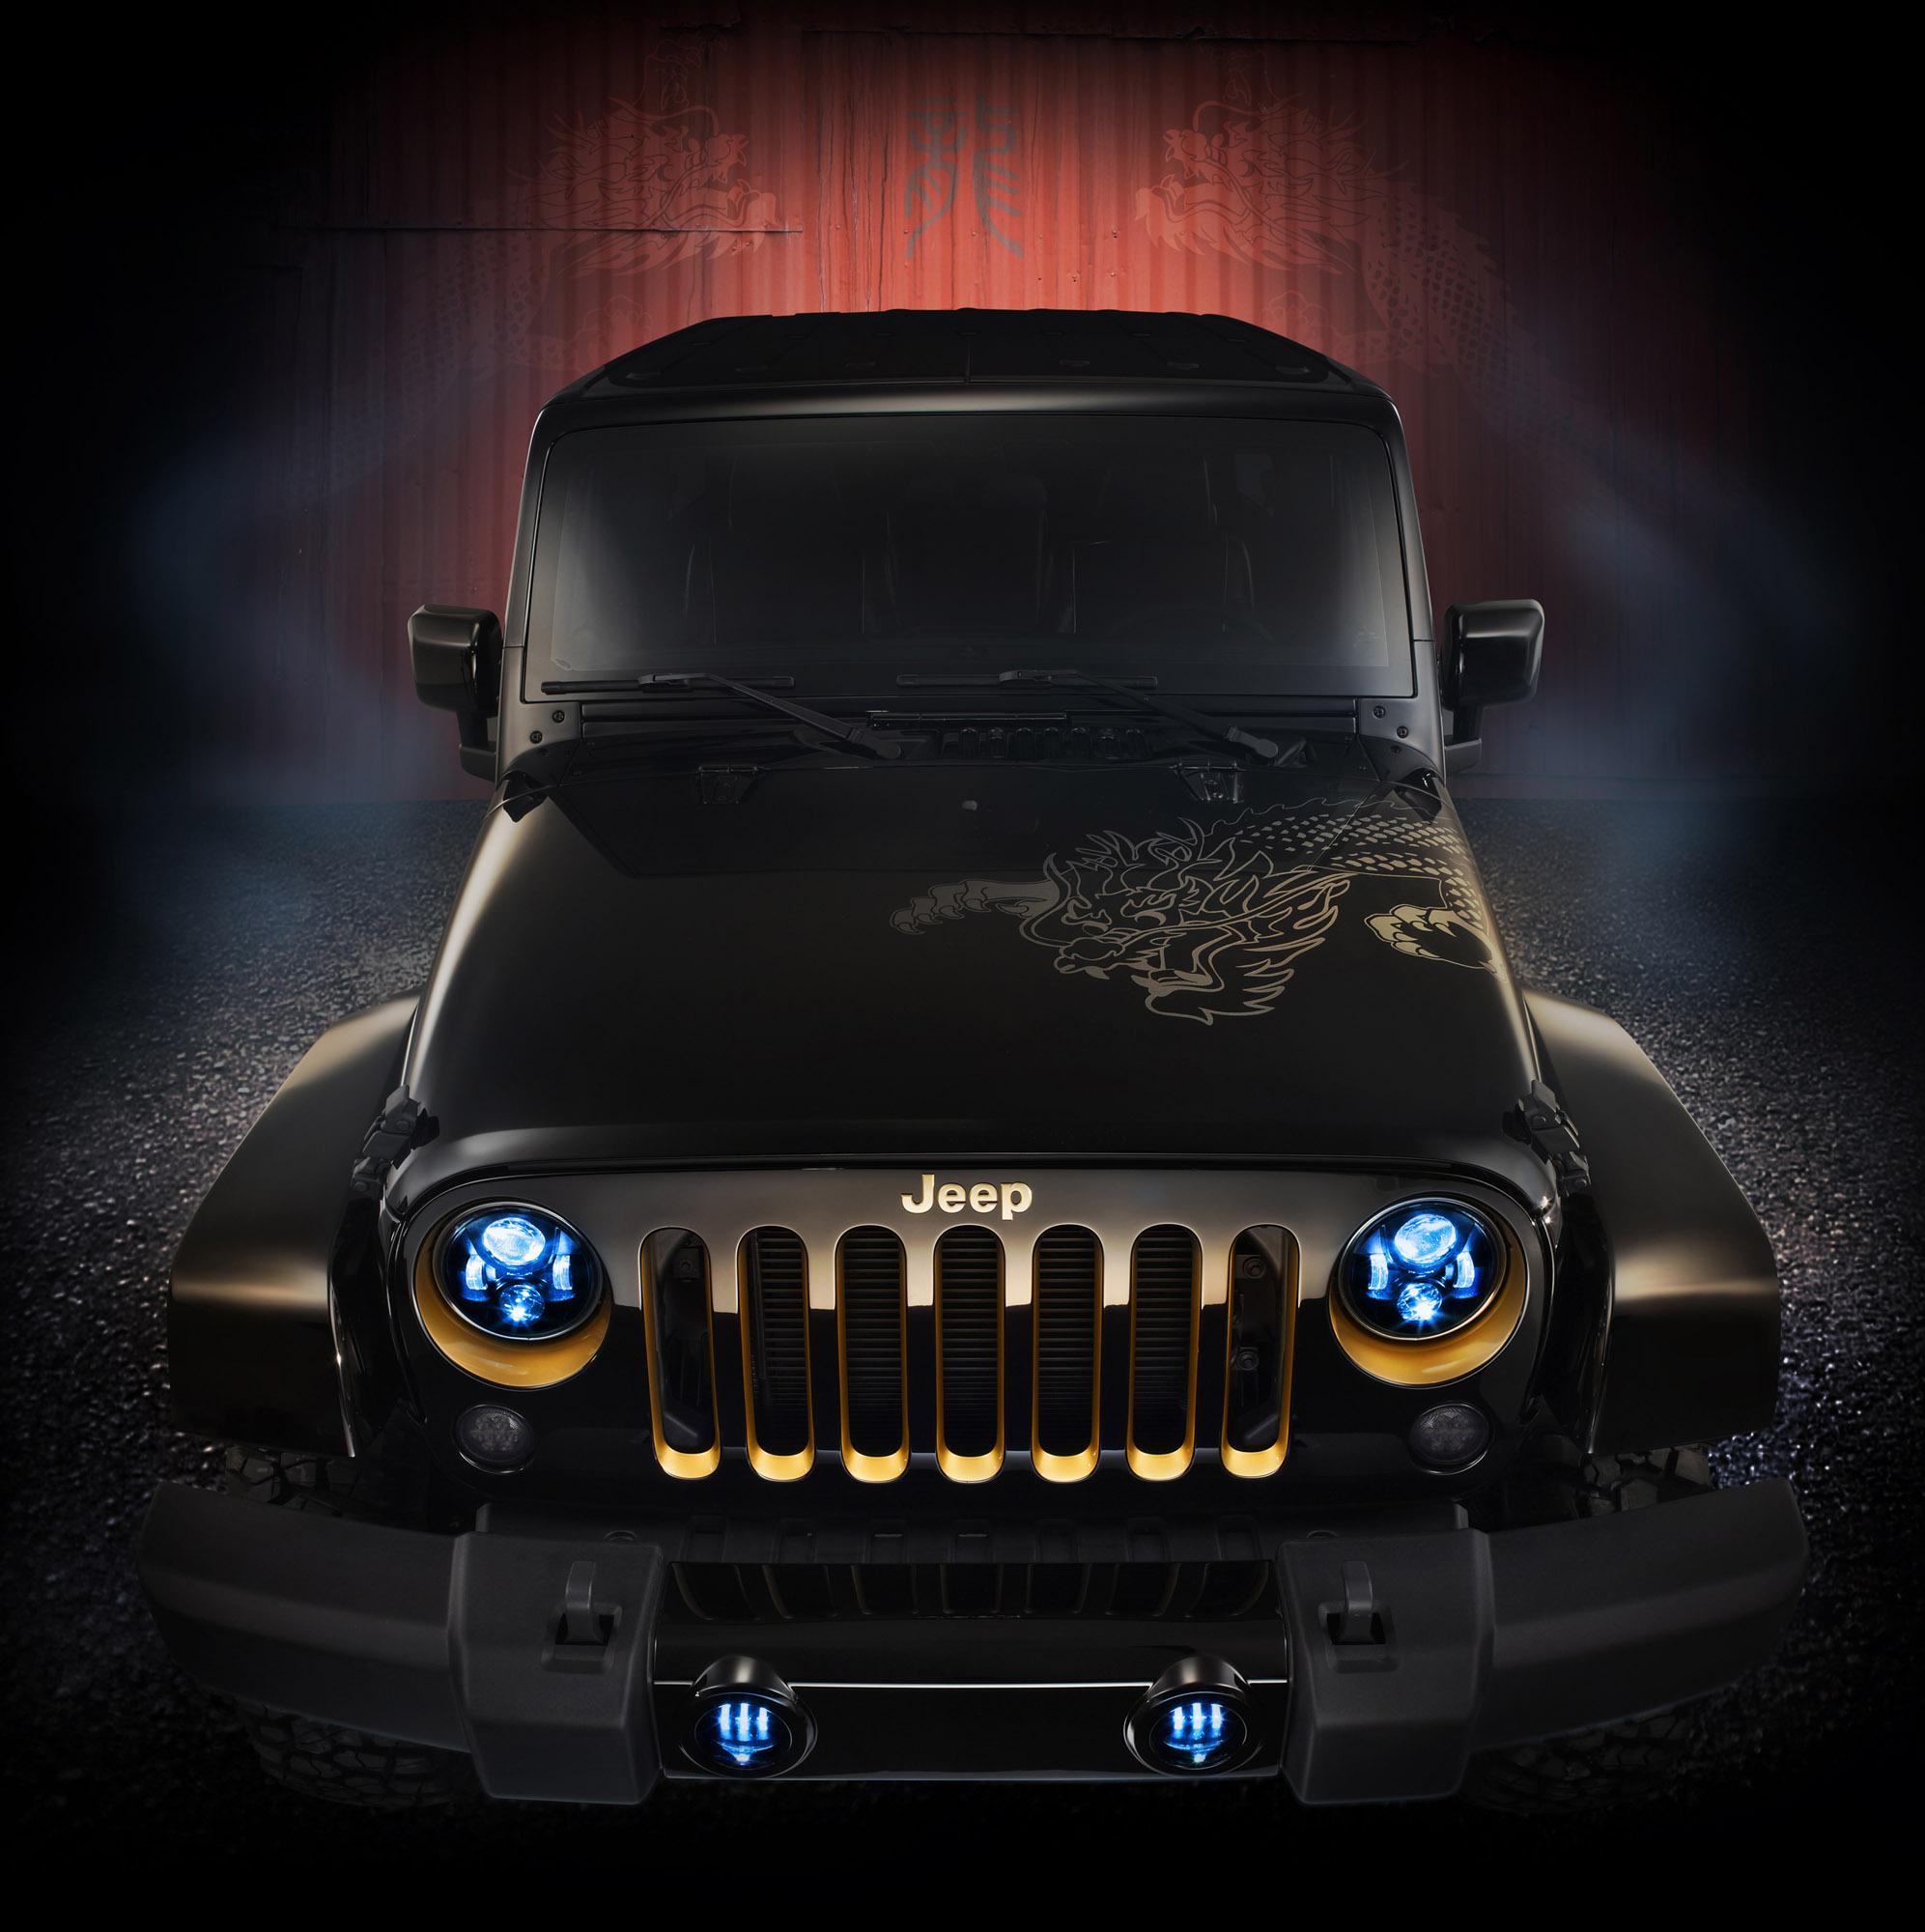 2014 Jeep Wrangler Dragon Edition - US Price $36,095